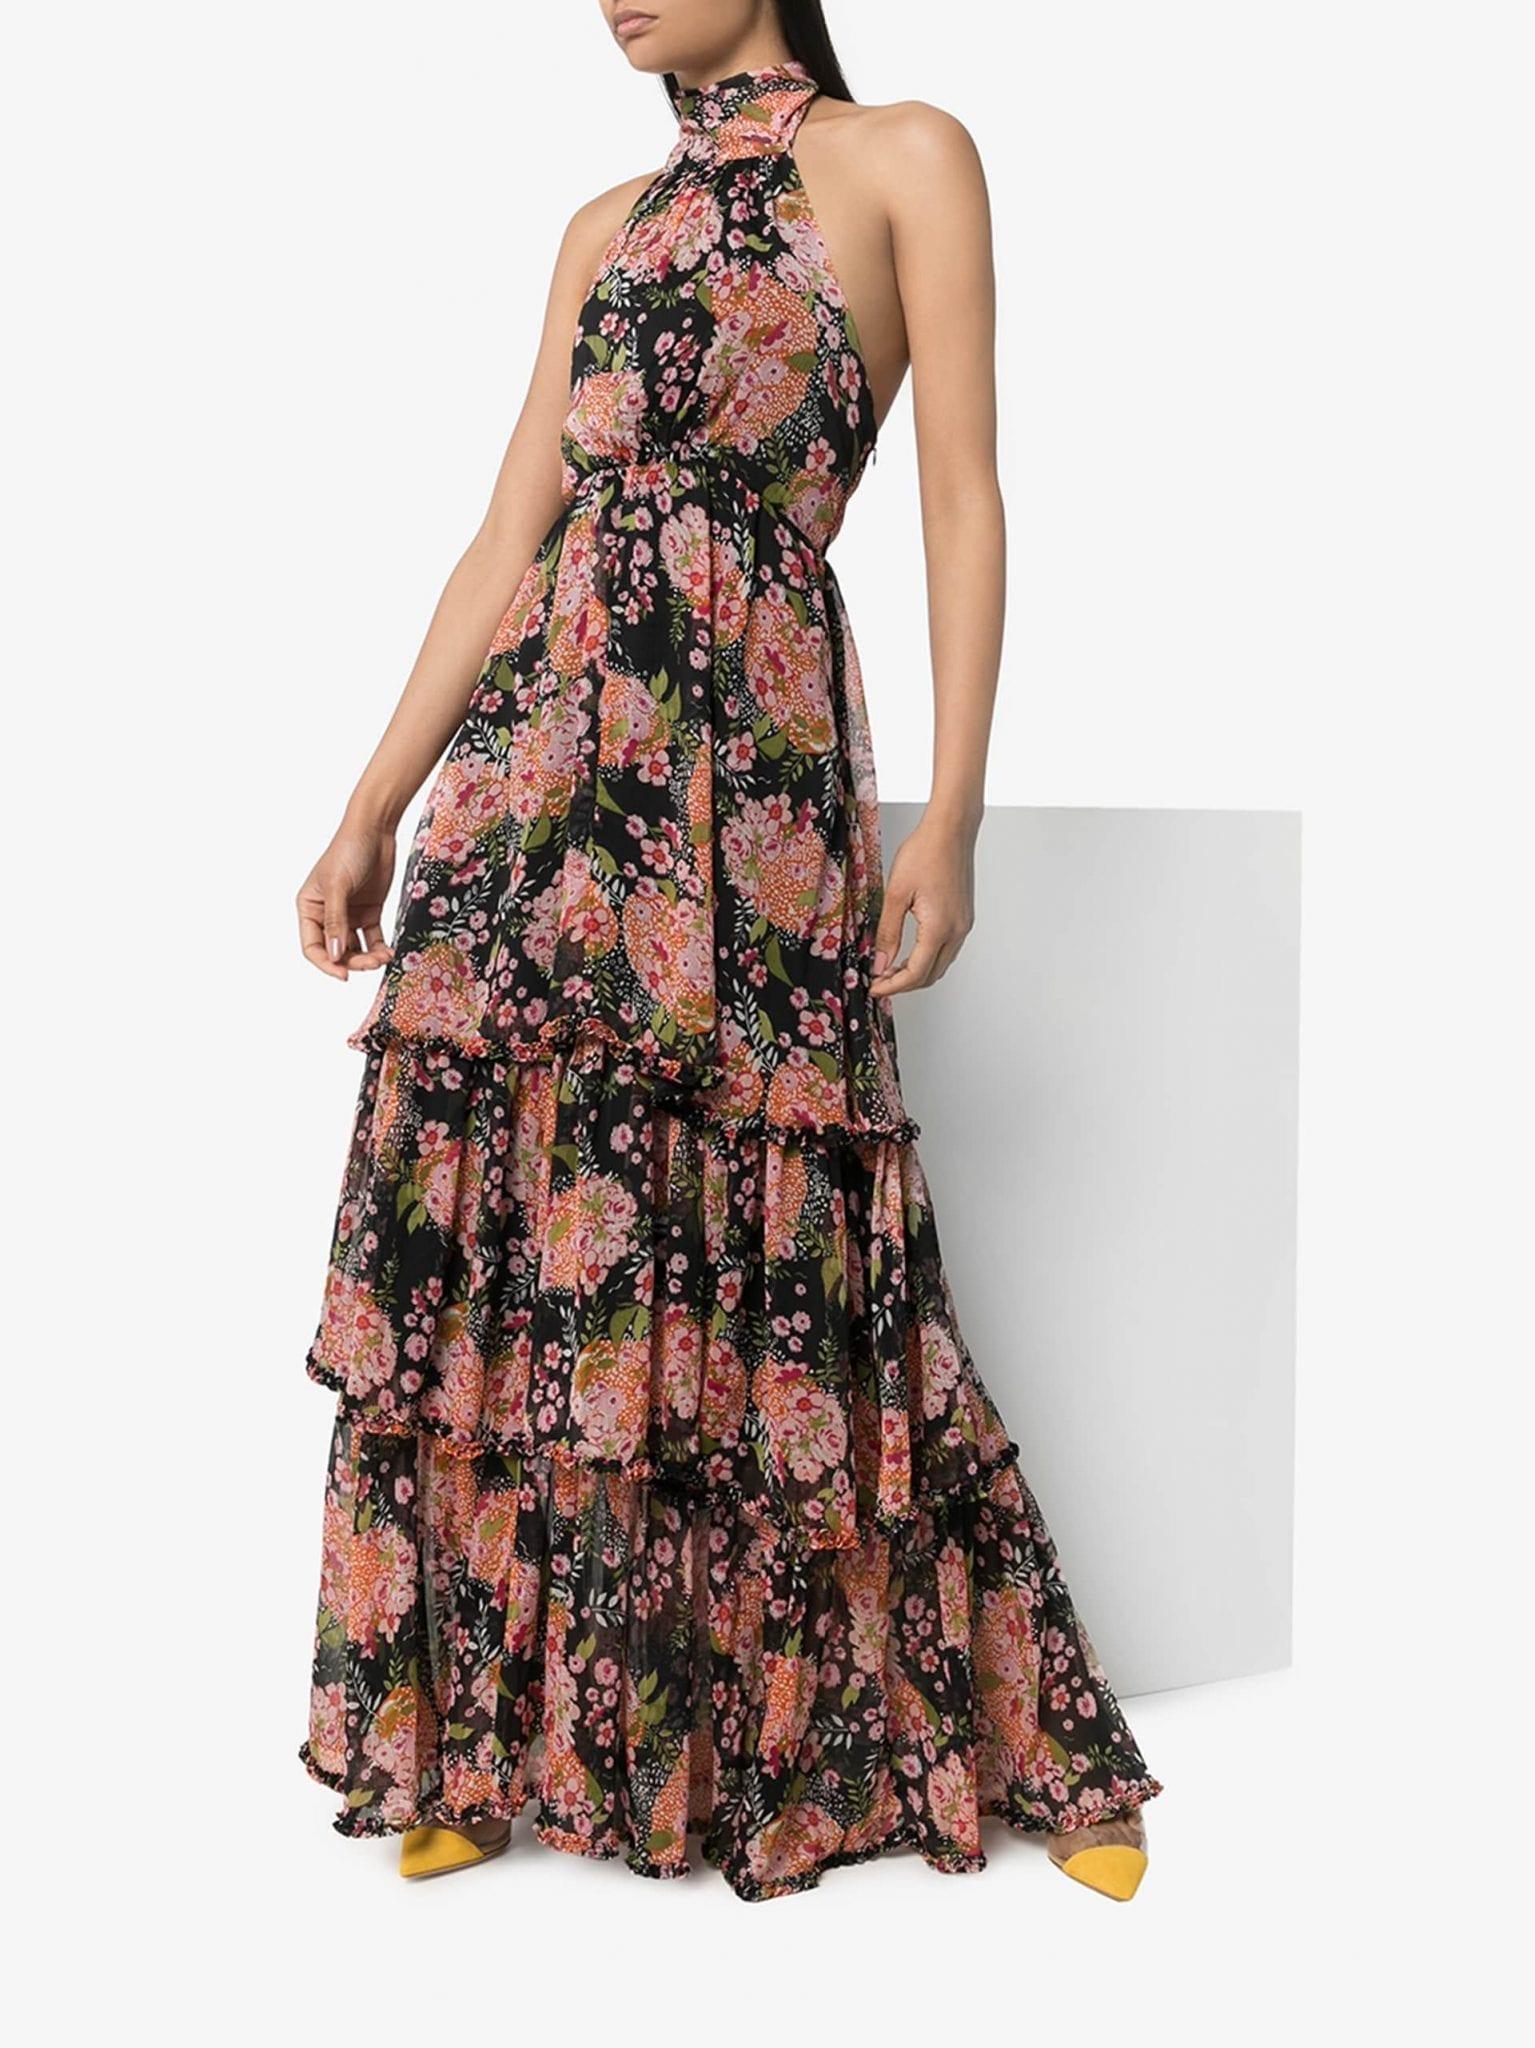 BYTIMO Halterneck Floral Print Maxi Dress